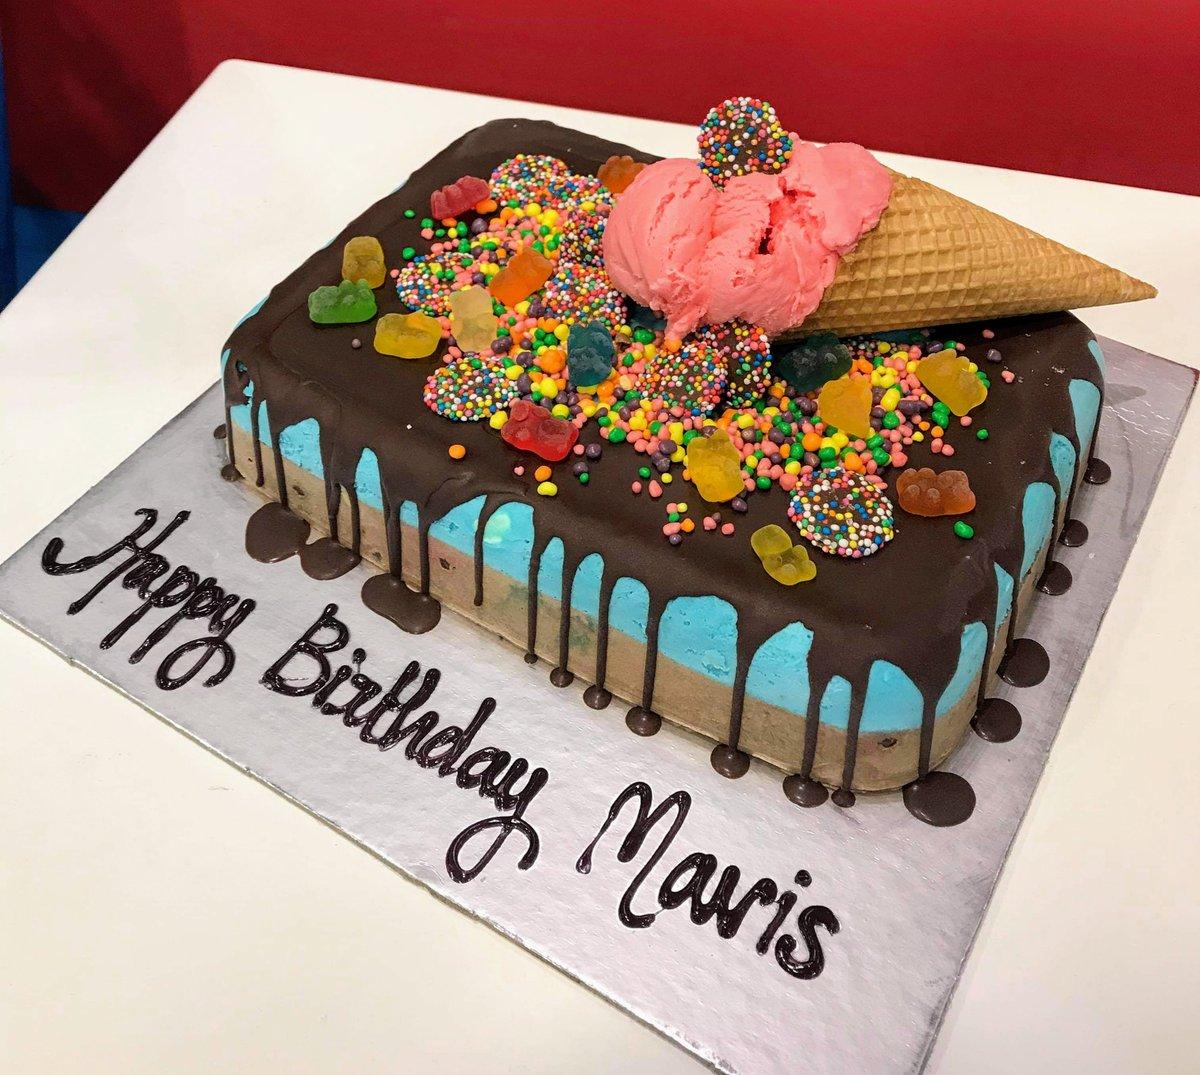 coldrockcakes: Ice Cream cake by Cold Rock Aspley. Call us on 0417 115 707 to place your order. #brisbane #coldrock #fridays #dessert #weddingcake #food #chocolate  #party #love #happybirthday #cake #celebrate #happy #drawing #relationships #icecreamcakepic.twitter.com/yGlvBXV01s